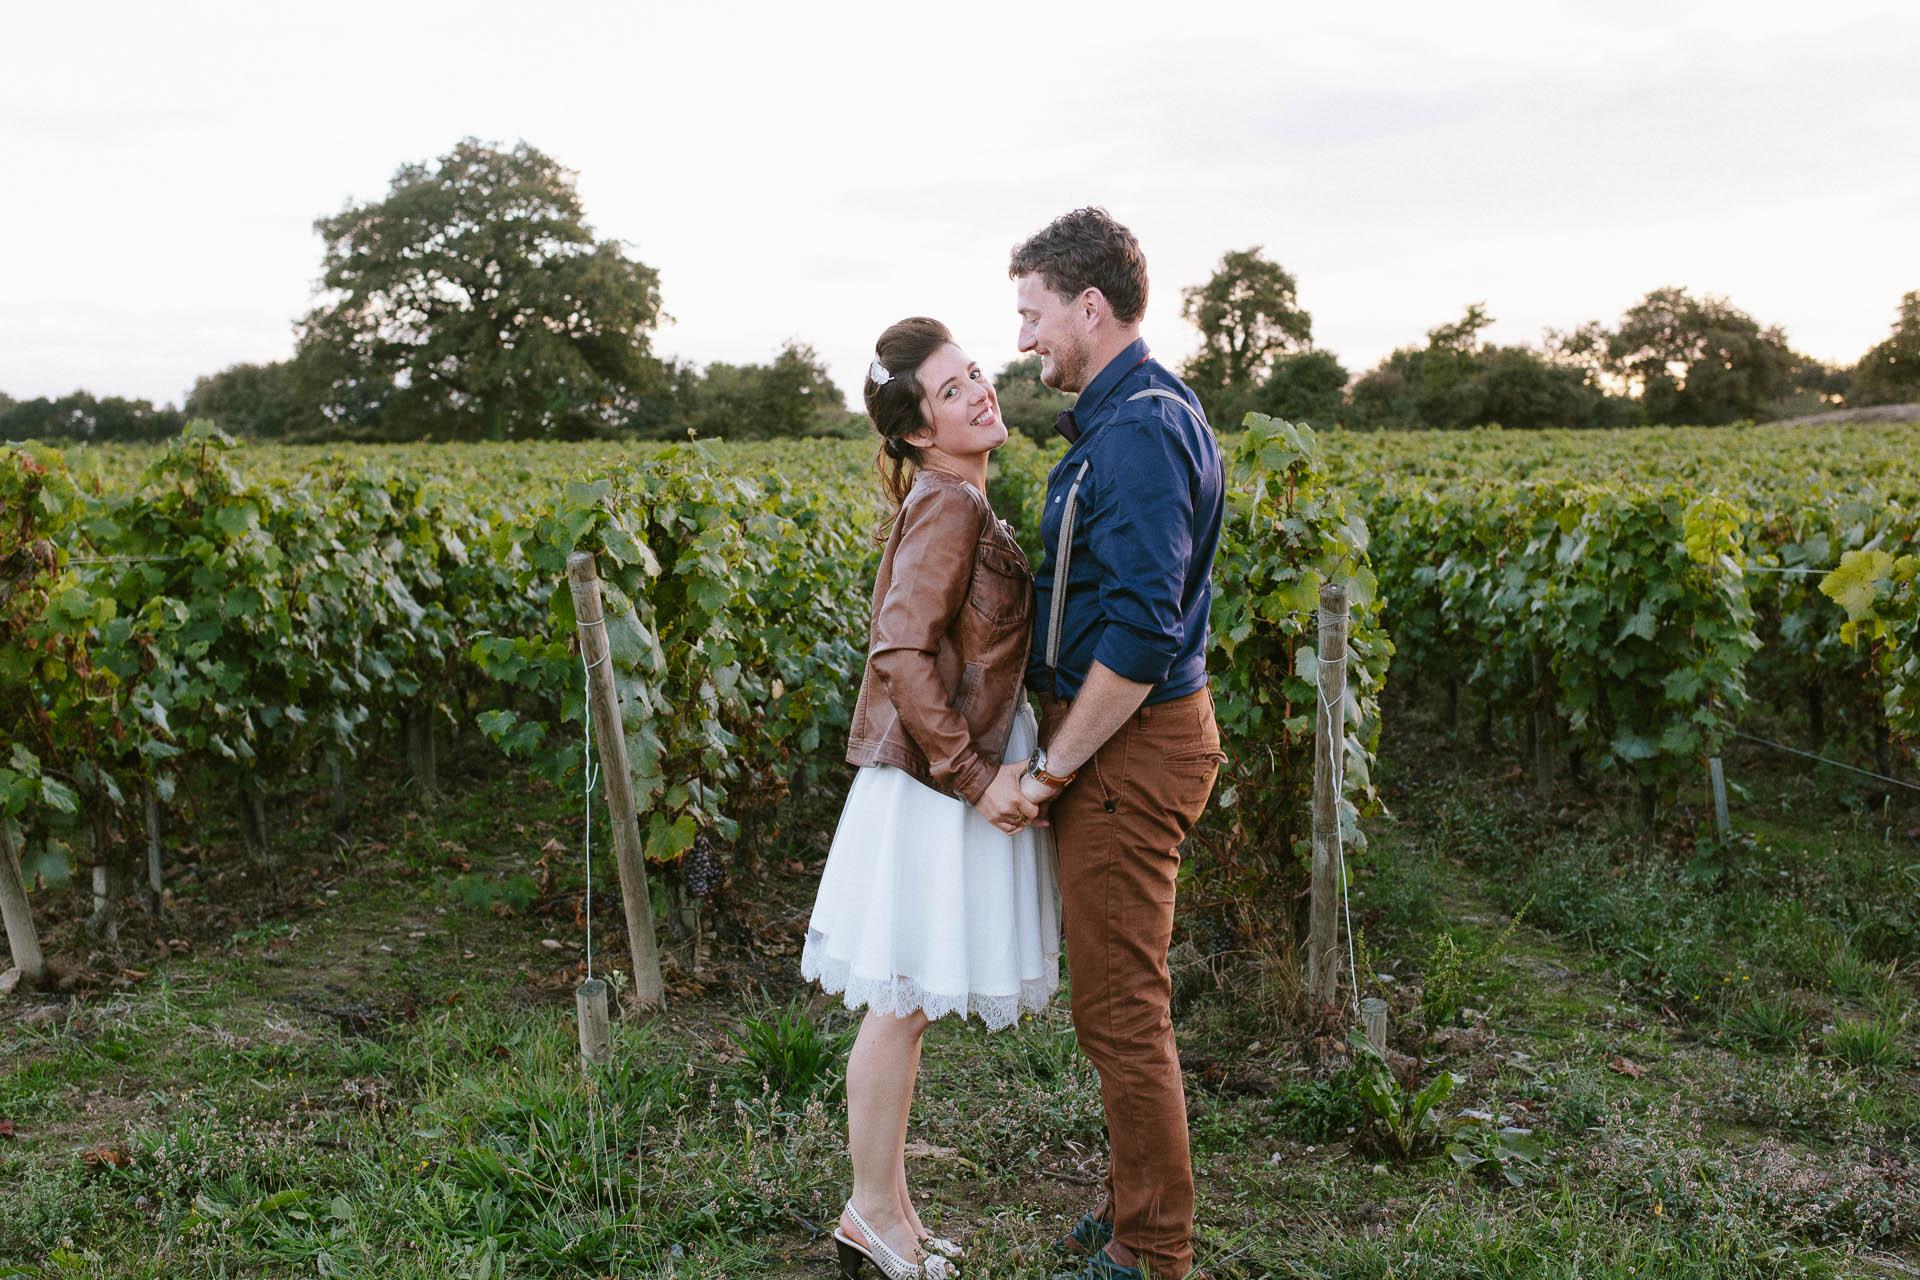 mariage_vignobles_mourat_vendee_jeremy_agathe_flavie_nelly-536